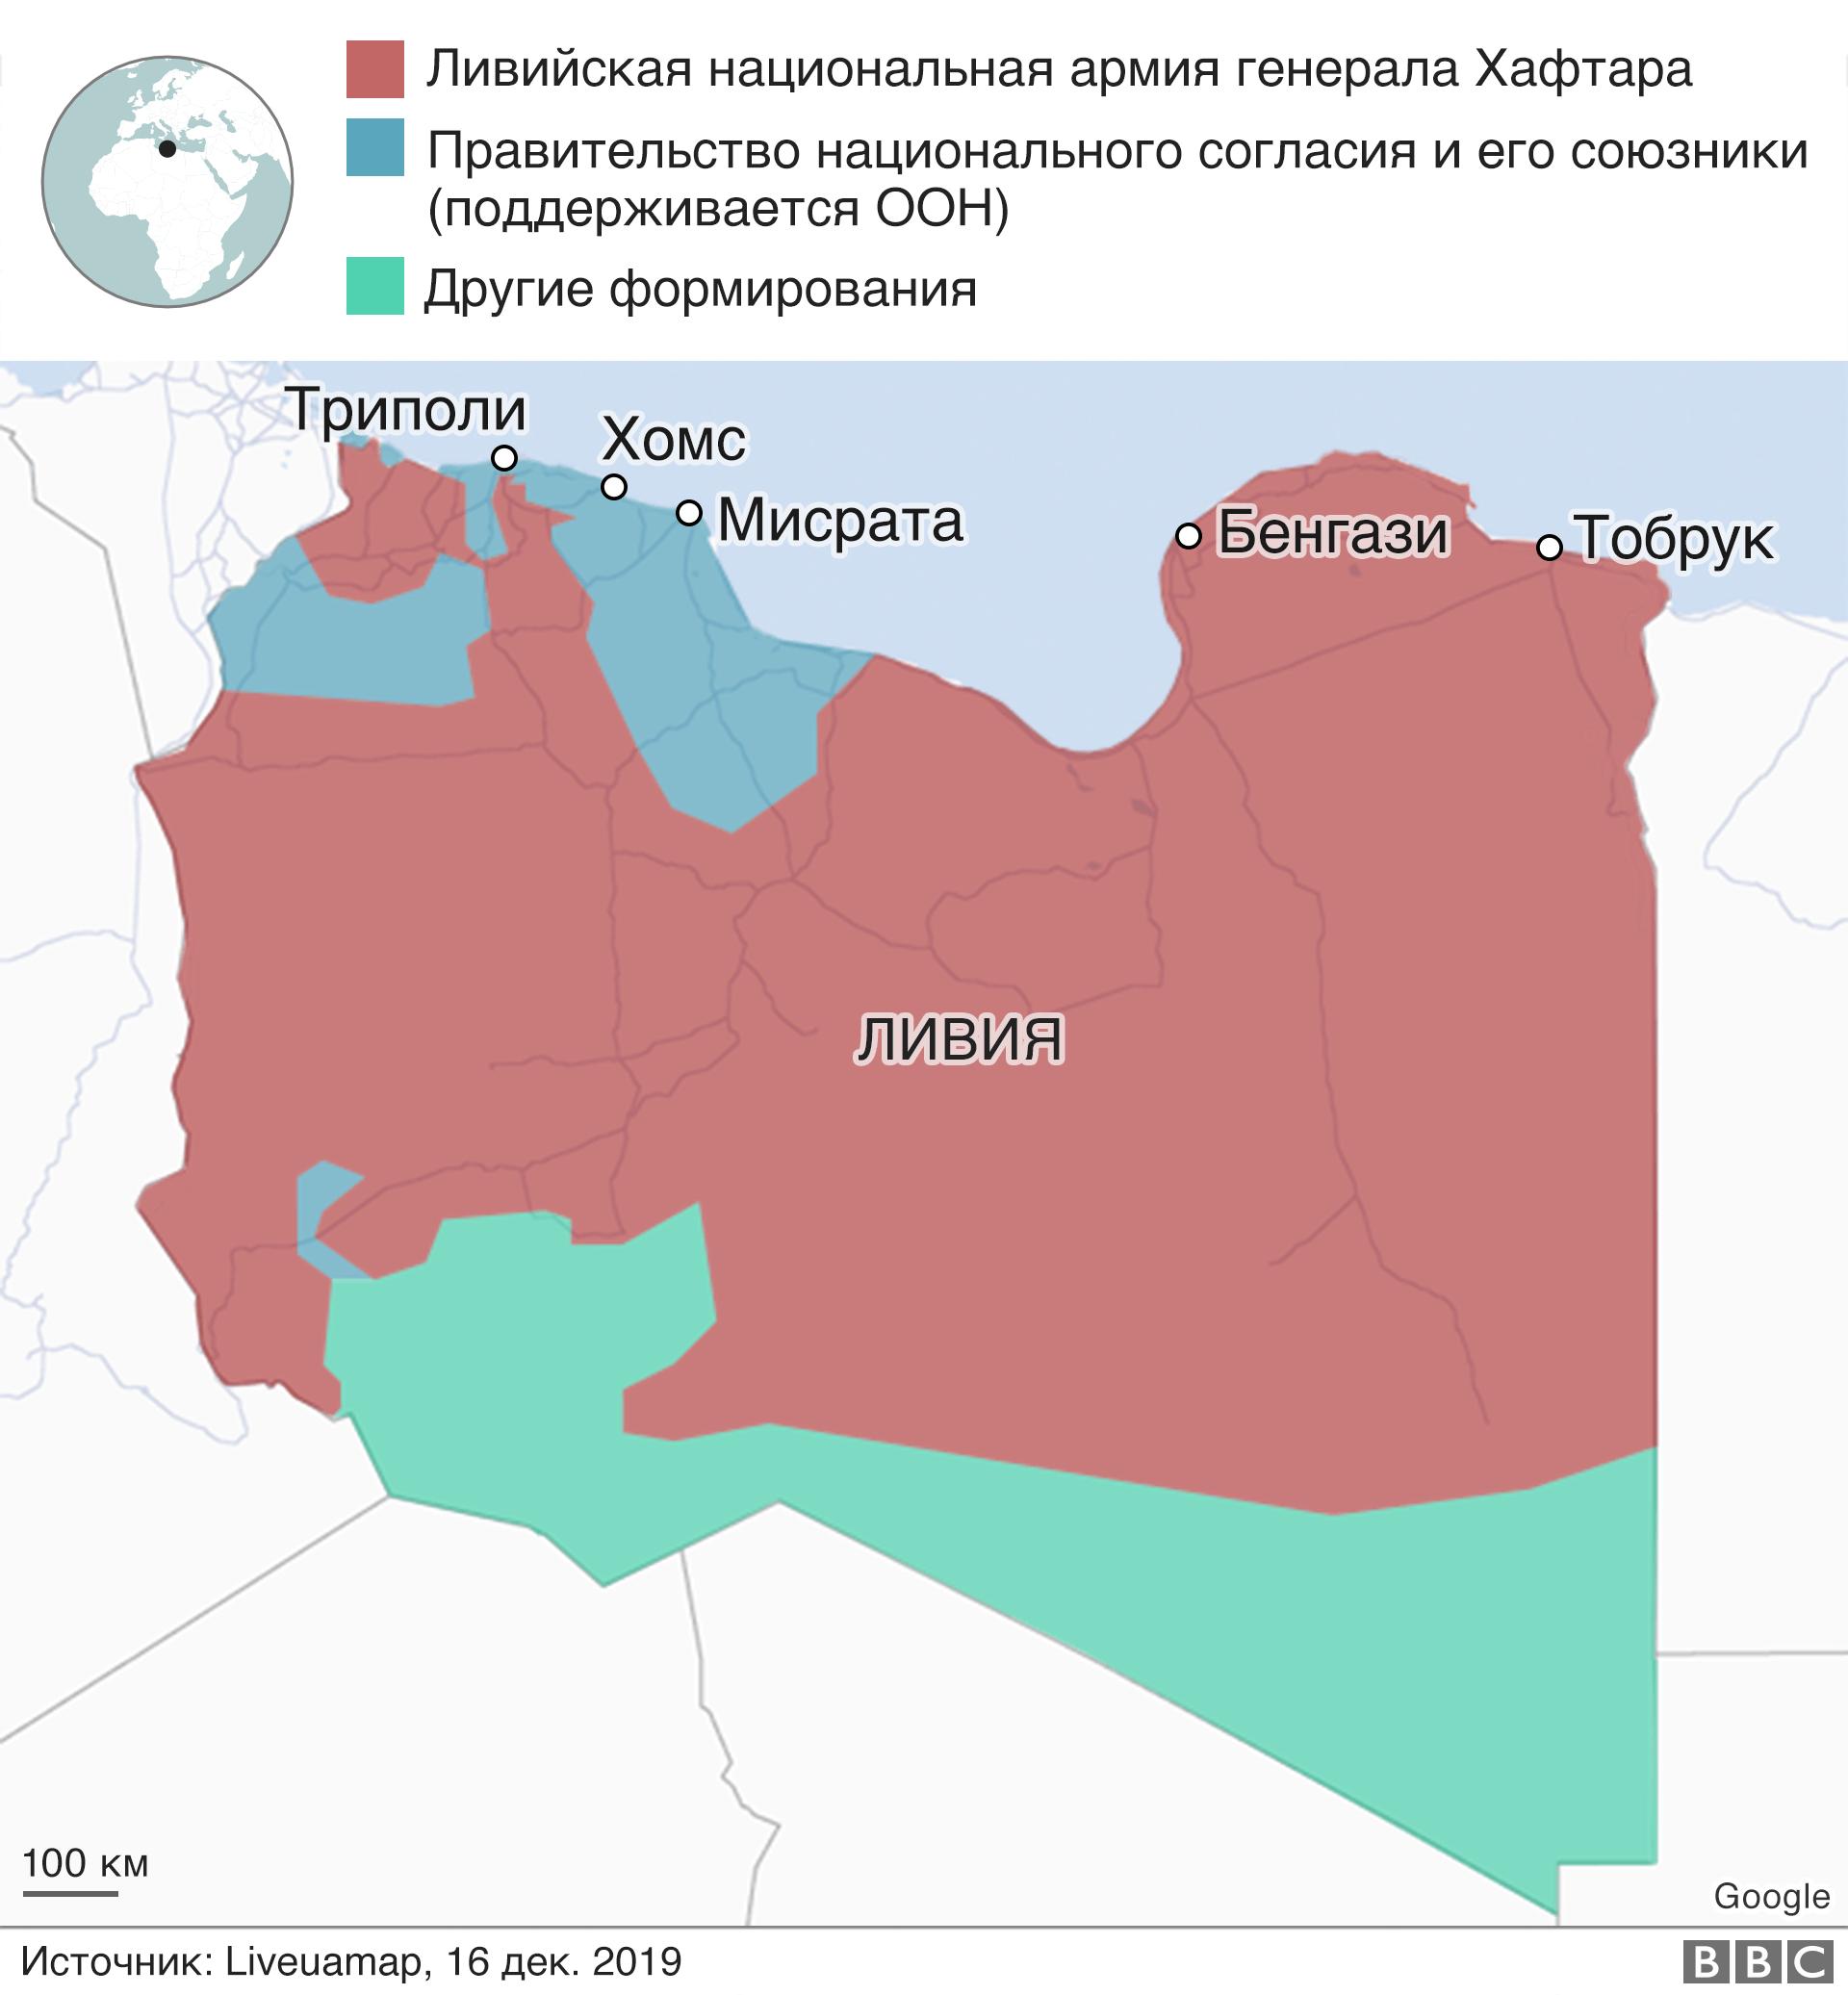 https://ichef.bbci.co.uk/news/624/cpsprodpb/14EC0/production/_110369658_libya_control_16_12_19_map_russian_640-nc.png